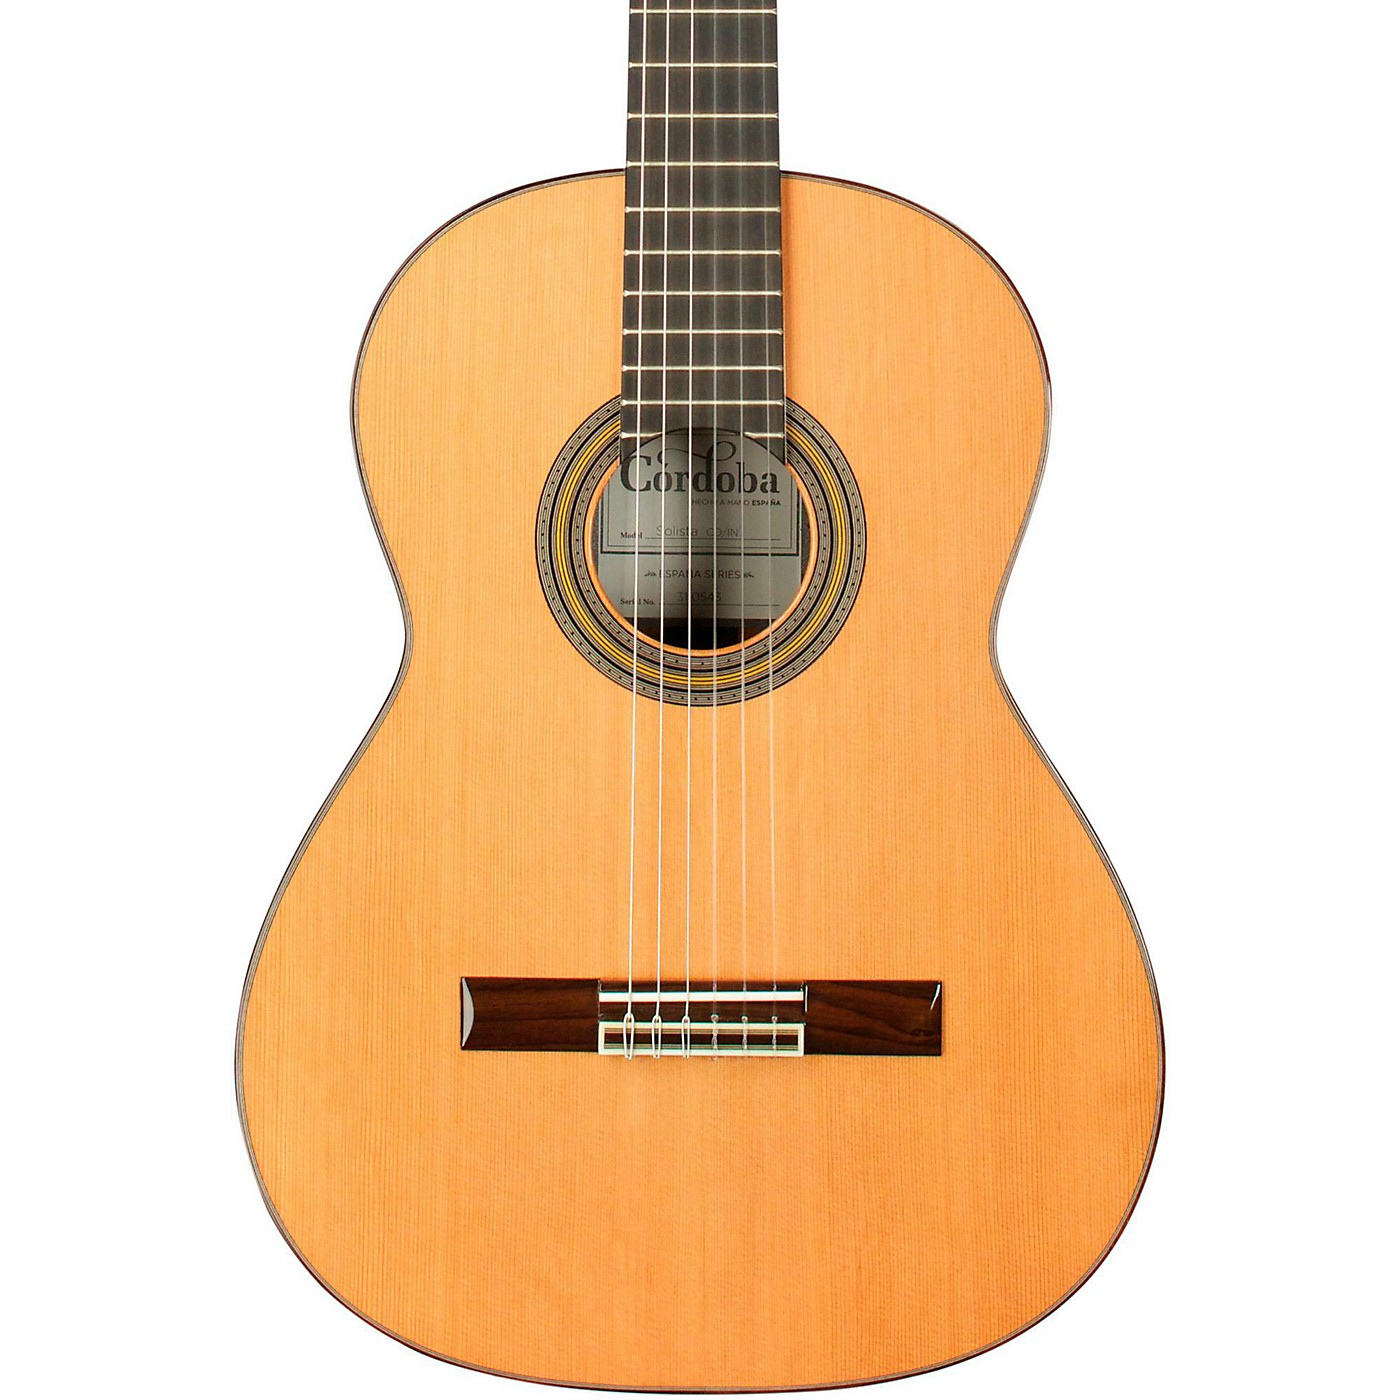 Cordoba Solista CD/IN Acoustic Nylon String Classical Guitar thumbnail